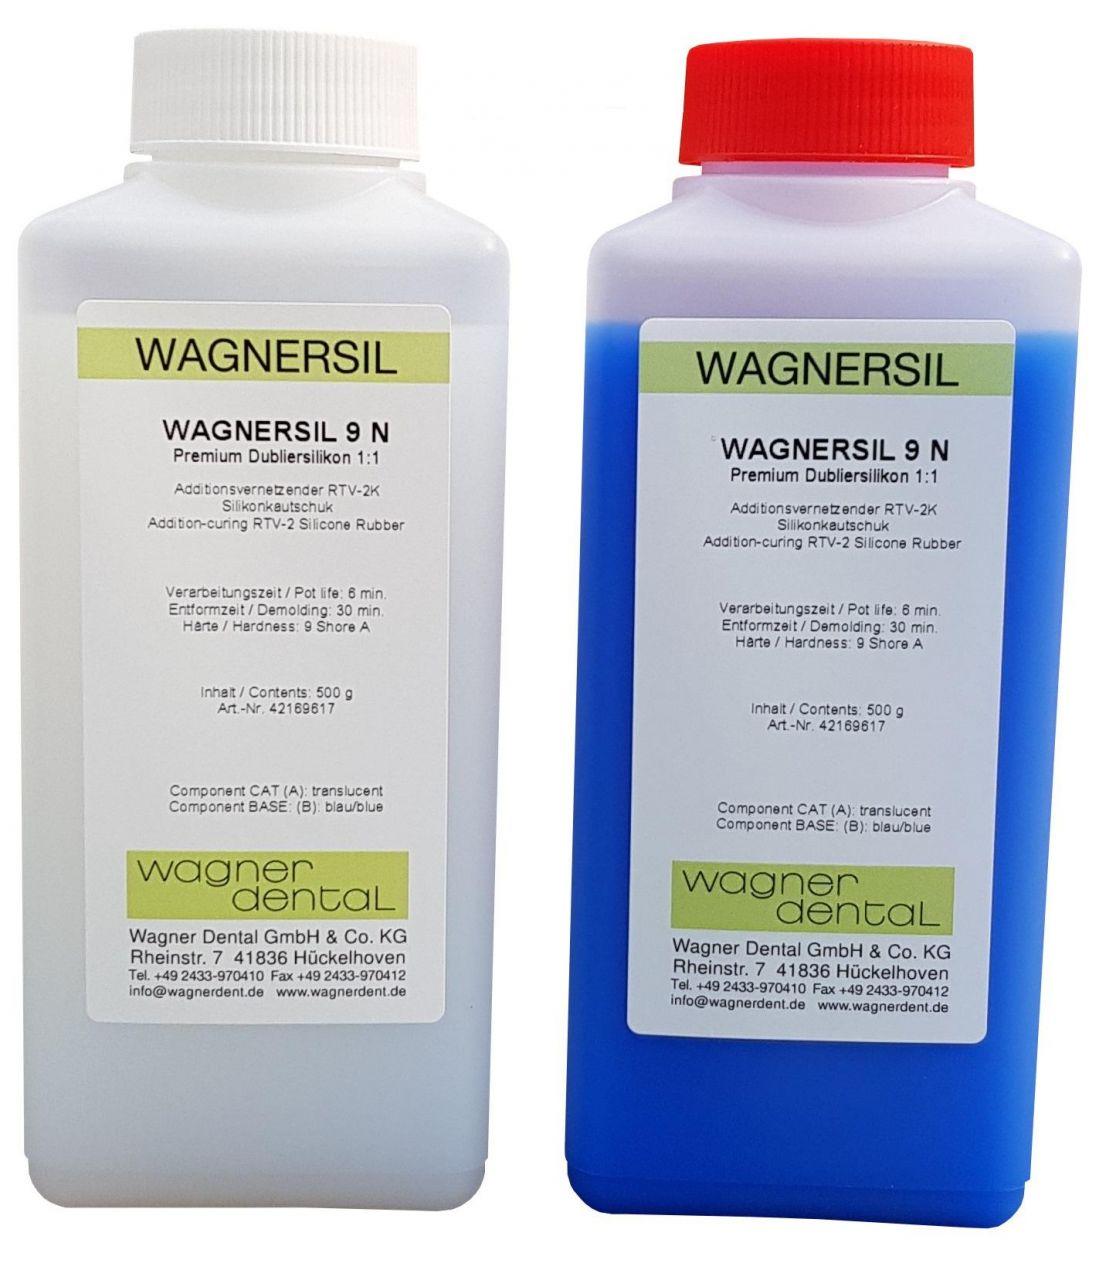 Wagnersil Premium 9 N blau Shore 9 EFZ 30 min 1:1